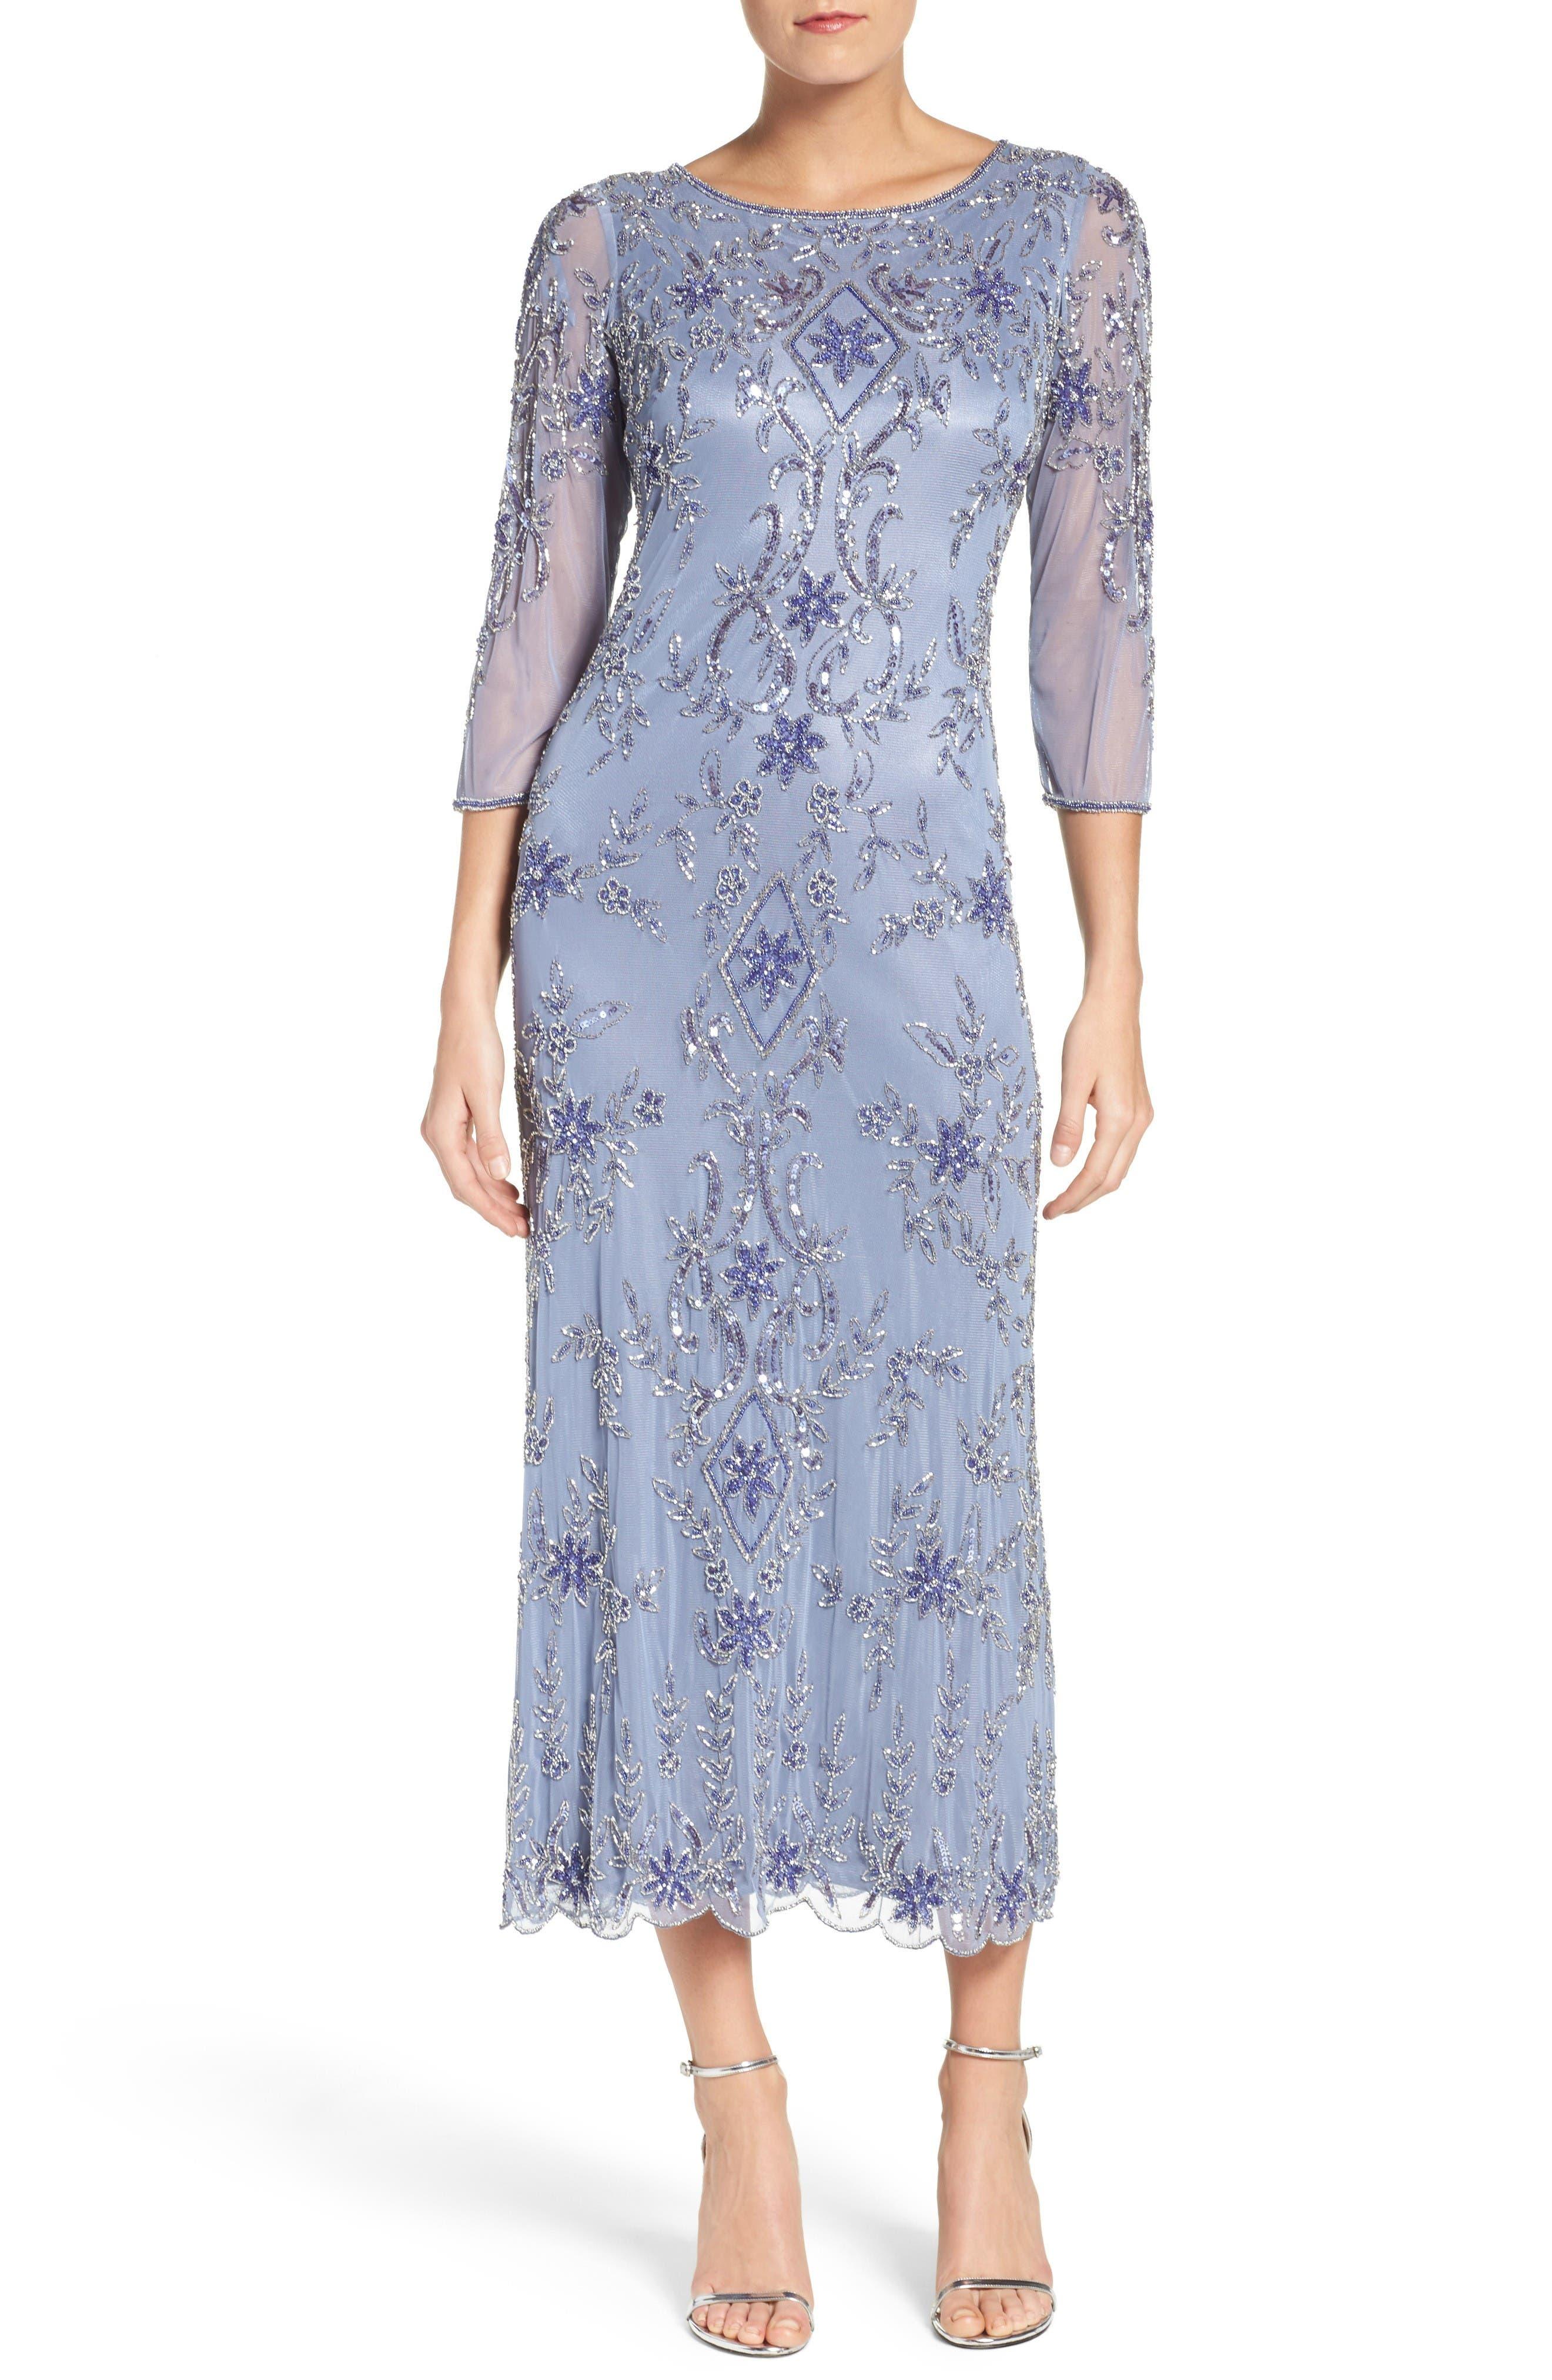 Alternate Image 1 Selected - Pisarro Nights Embellished Mesh Dress